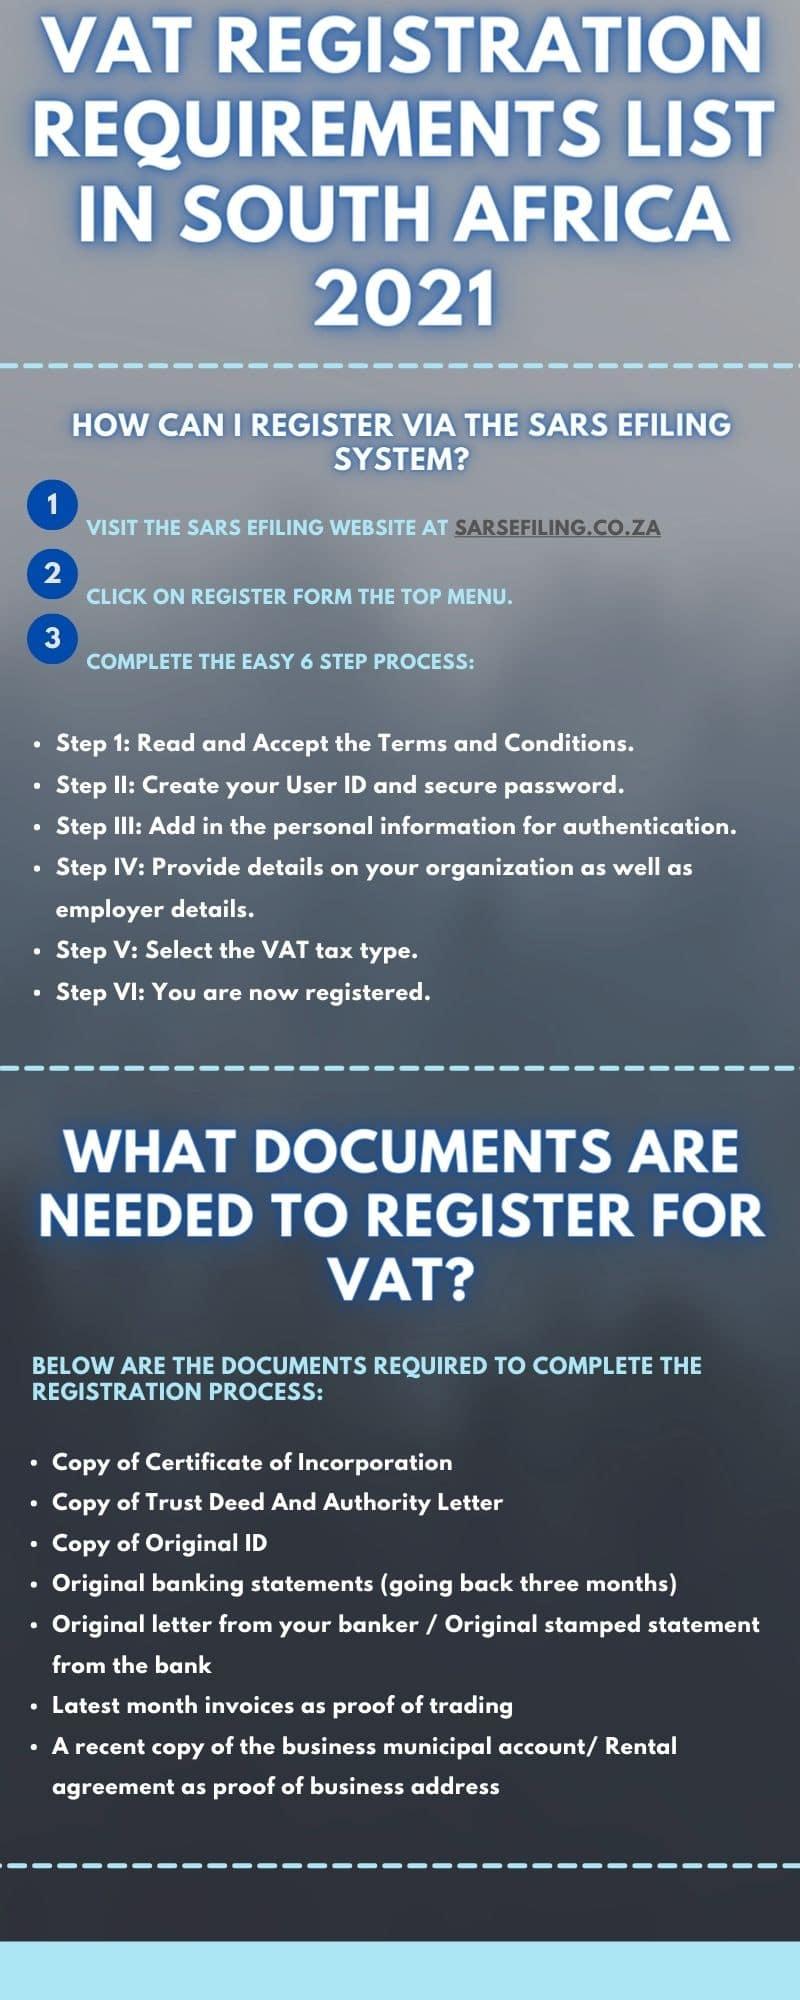 VAT registration requirements